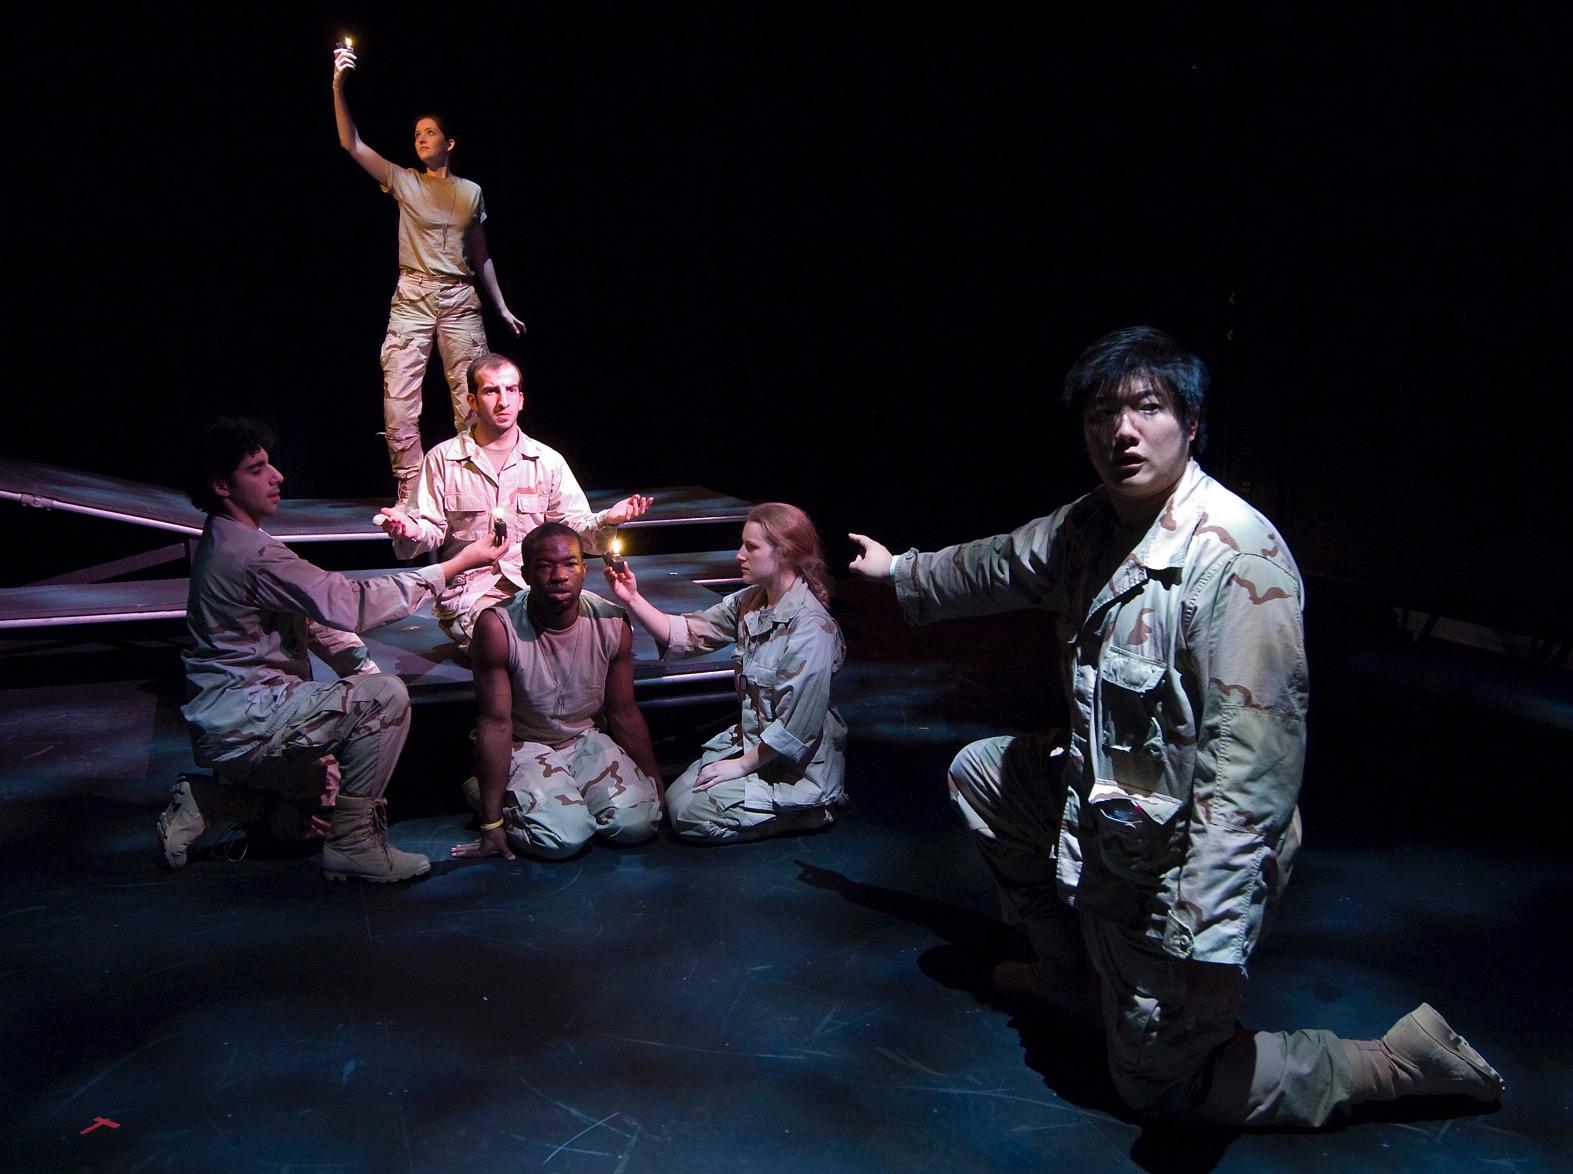 Virgil's  Aeneid: The Final Hours of Troy